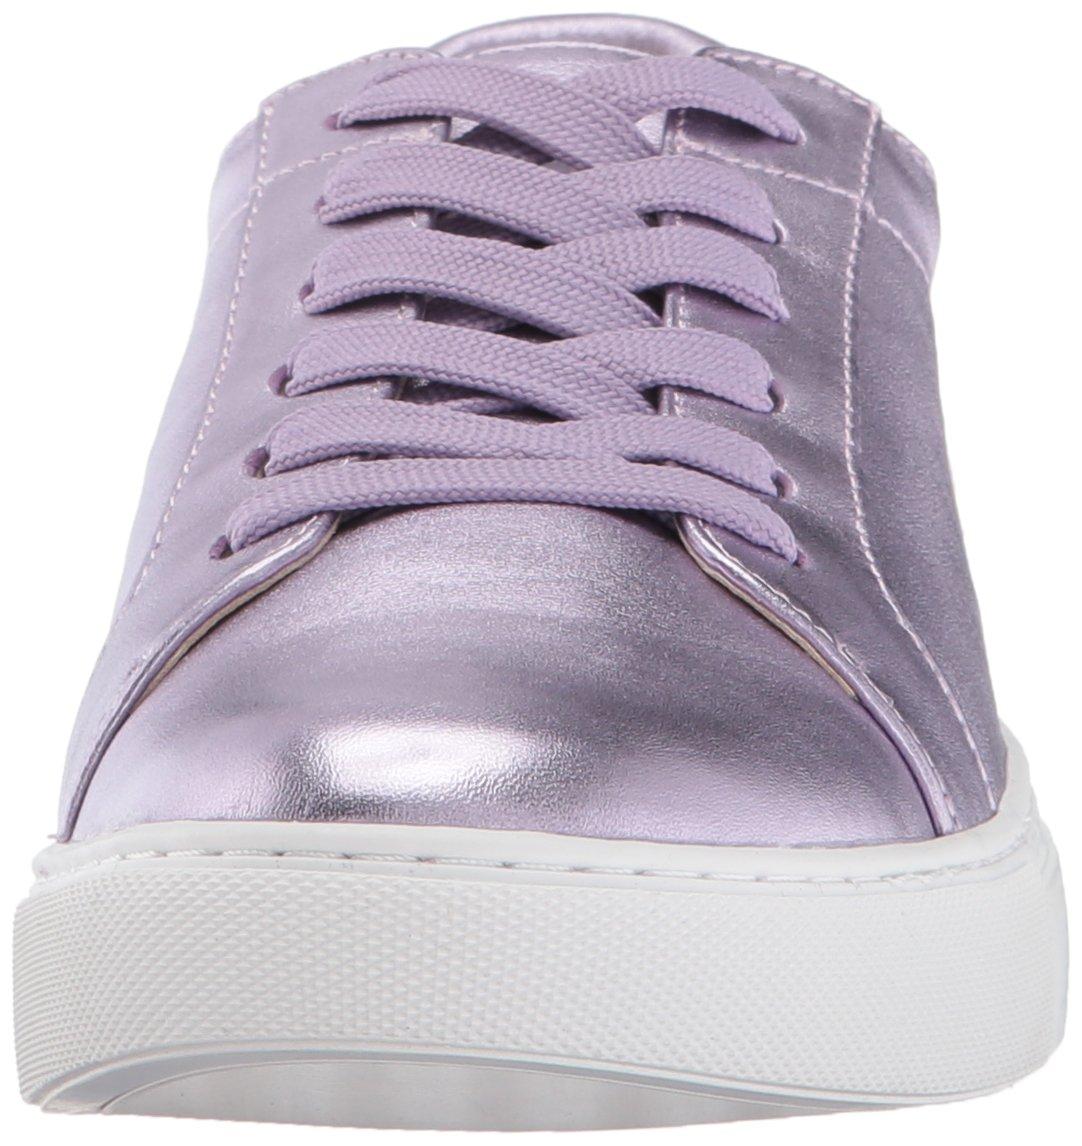 Kenneth Cole New York Women's Kam Low Profile Metallic Leather B(M) Fashion Sneaker B01MZD1KP3 8.5 B(M) Leather US Lavender b34c04